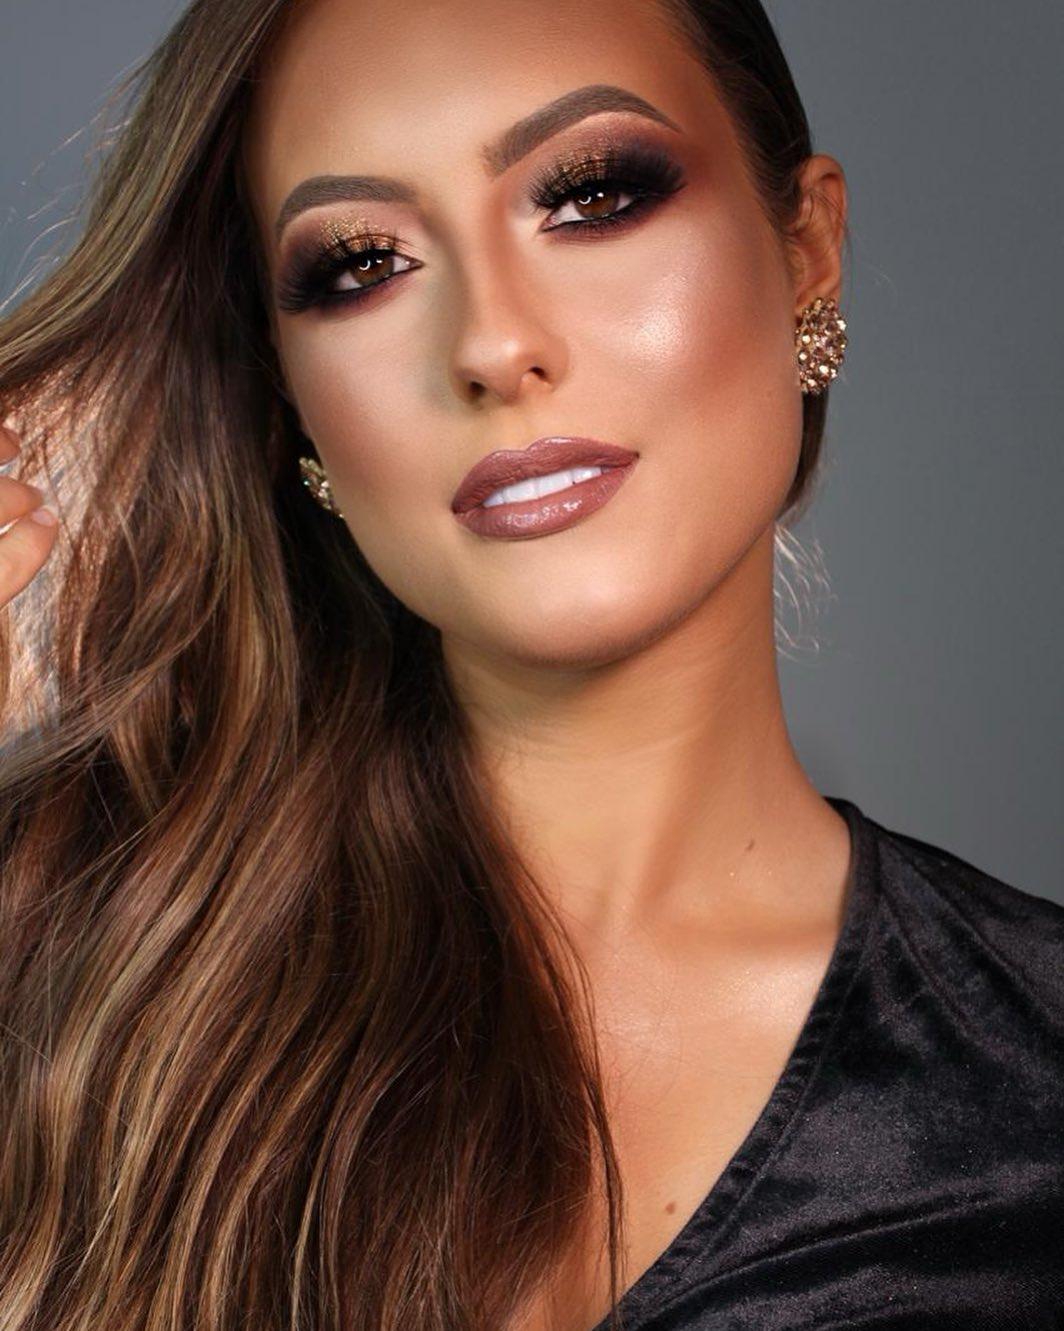 cristine boff sartor, segunda finalista de miss latinoamerica 2019. - Página 5 62407010